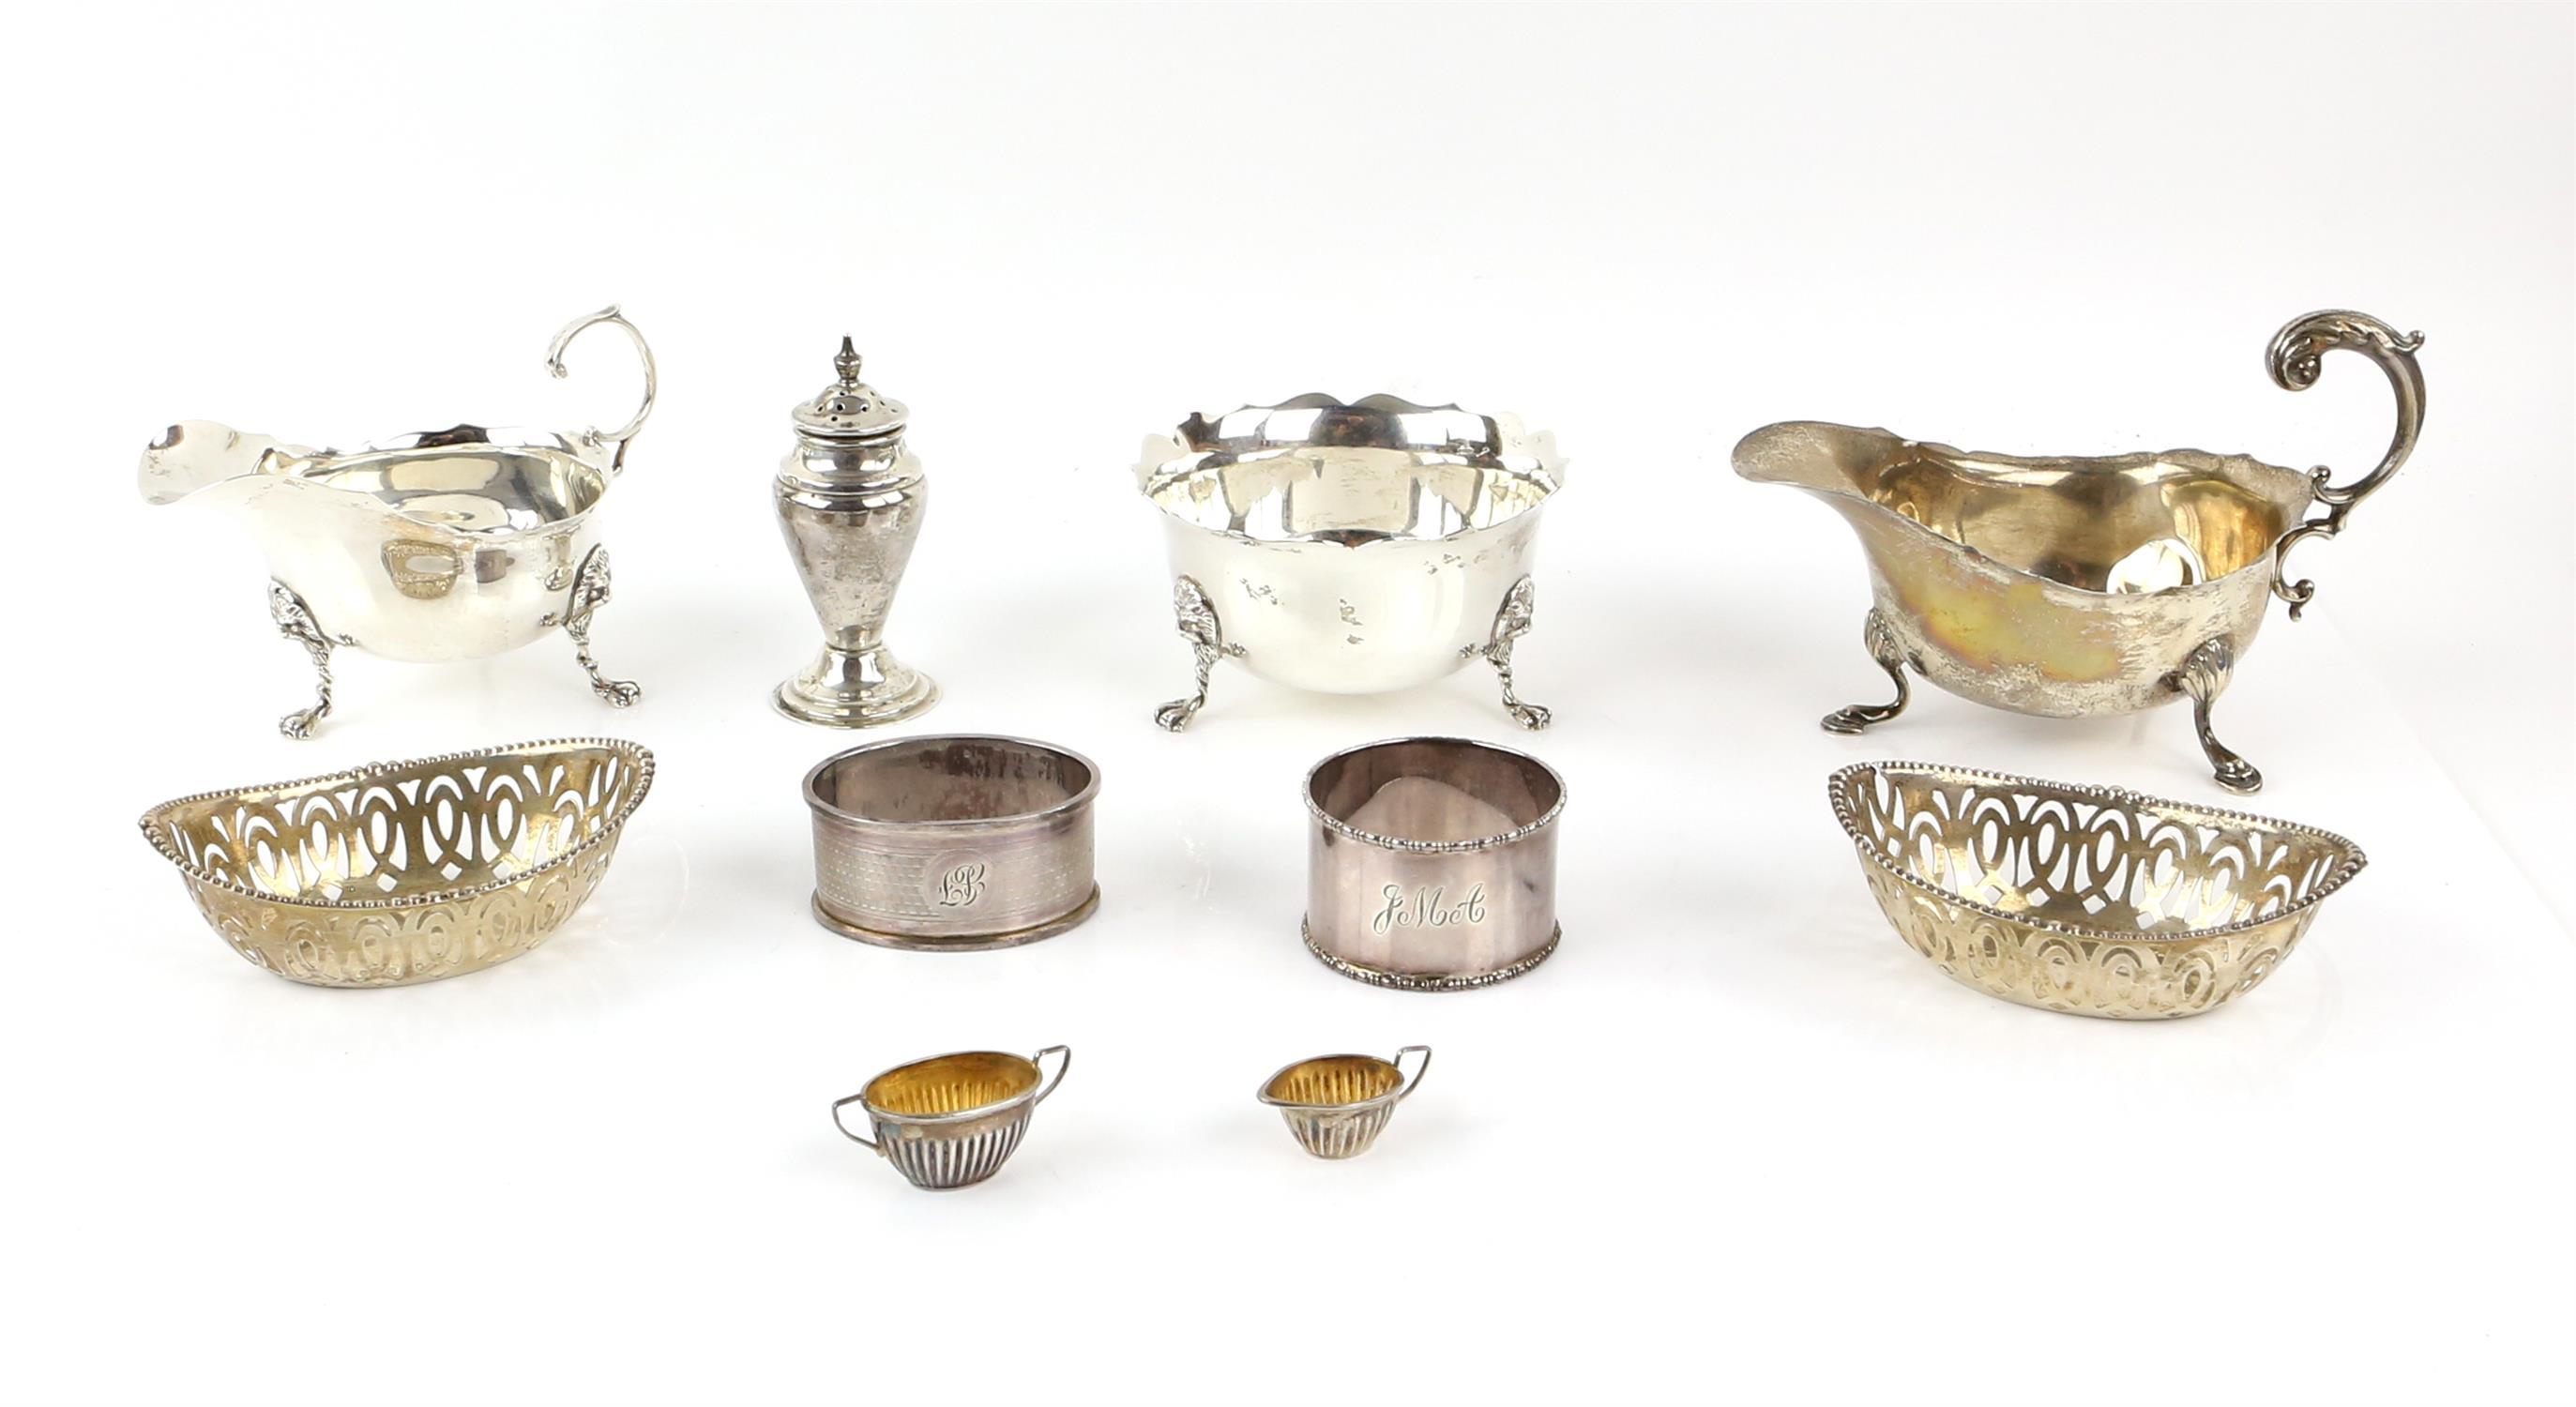 Pair of oval pierced silver bon-bon dishes, by Robert Pringle & Sons London 1927,